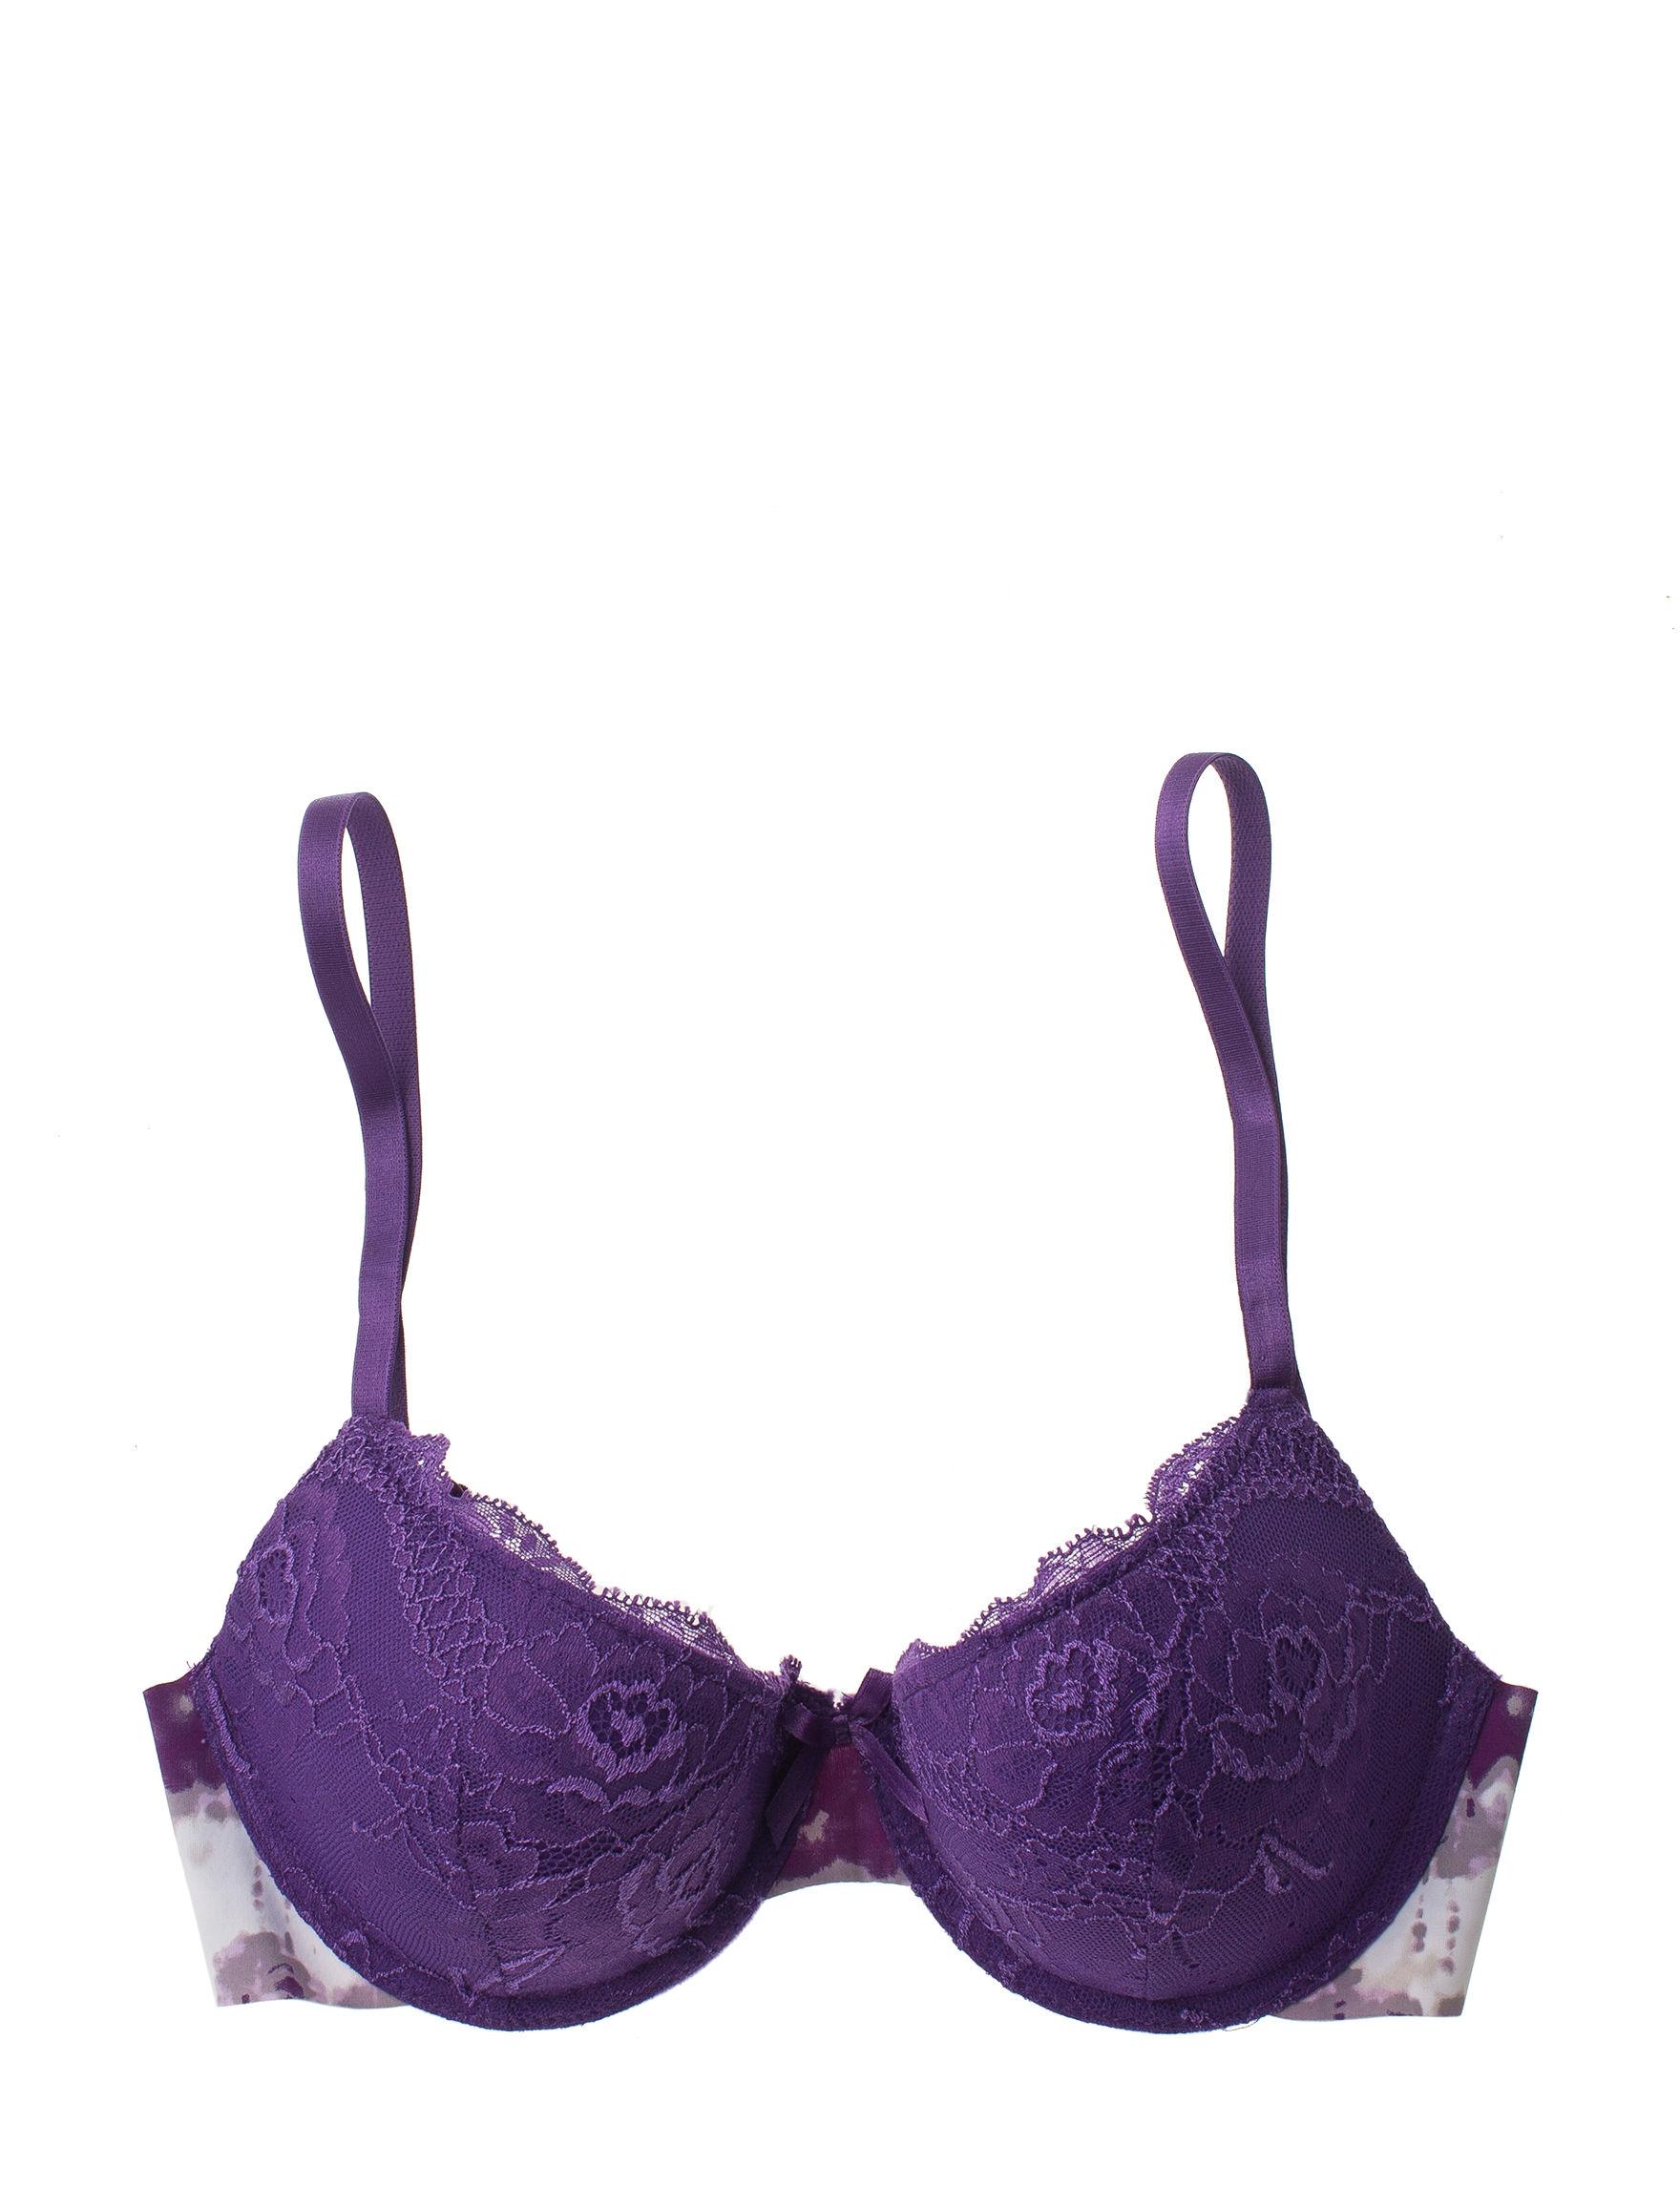 Rene Rofe Purple Bras Tshirt Bra